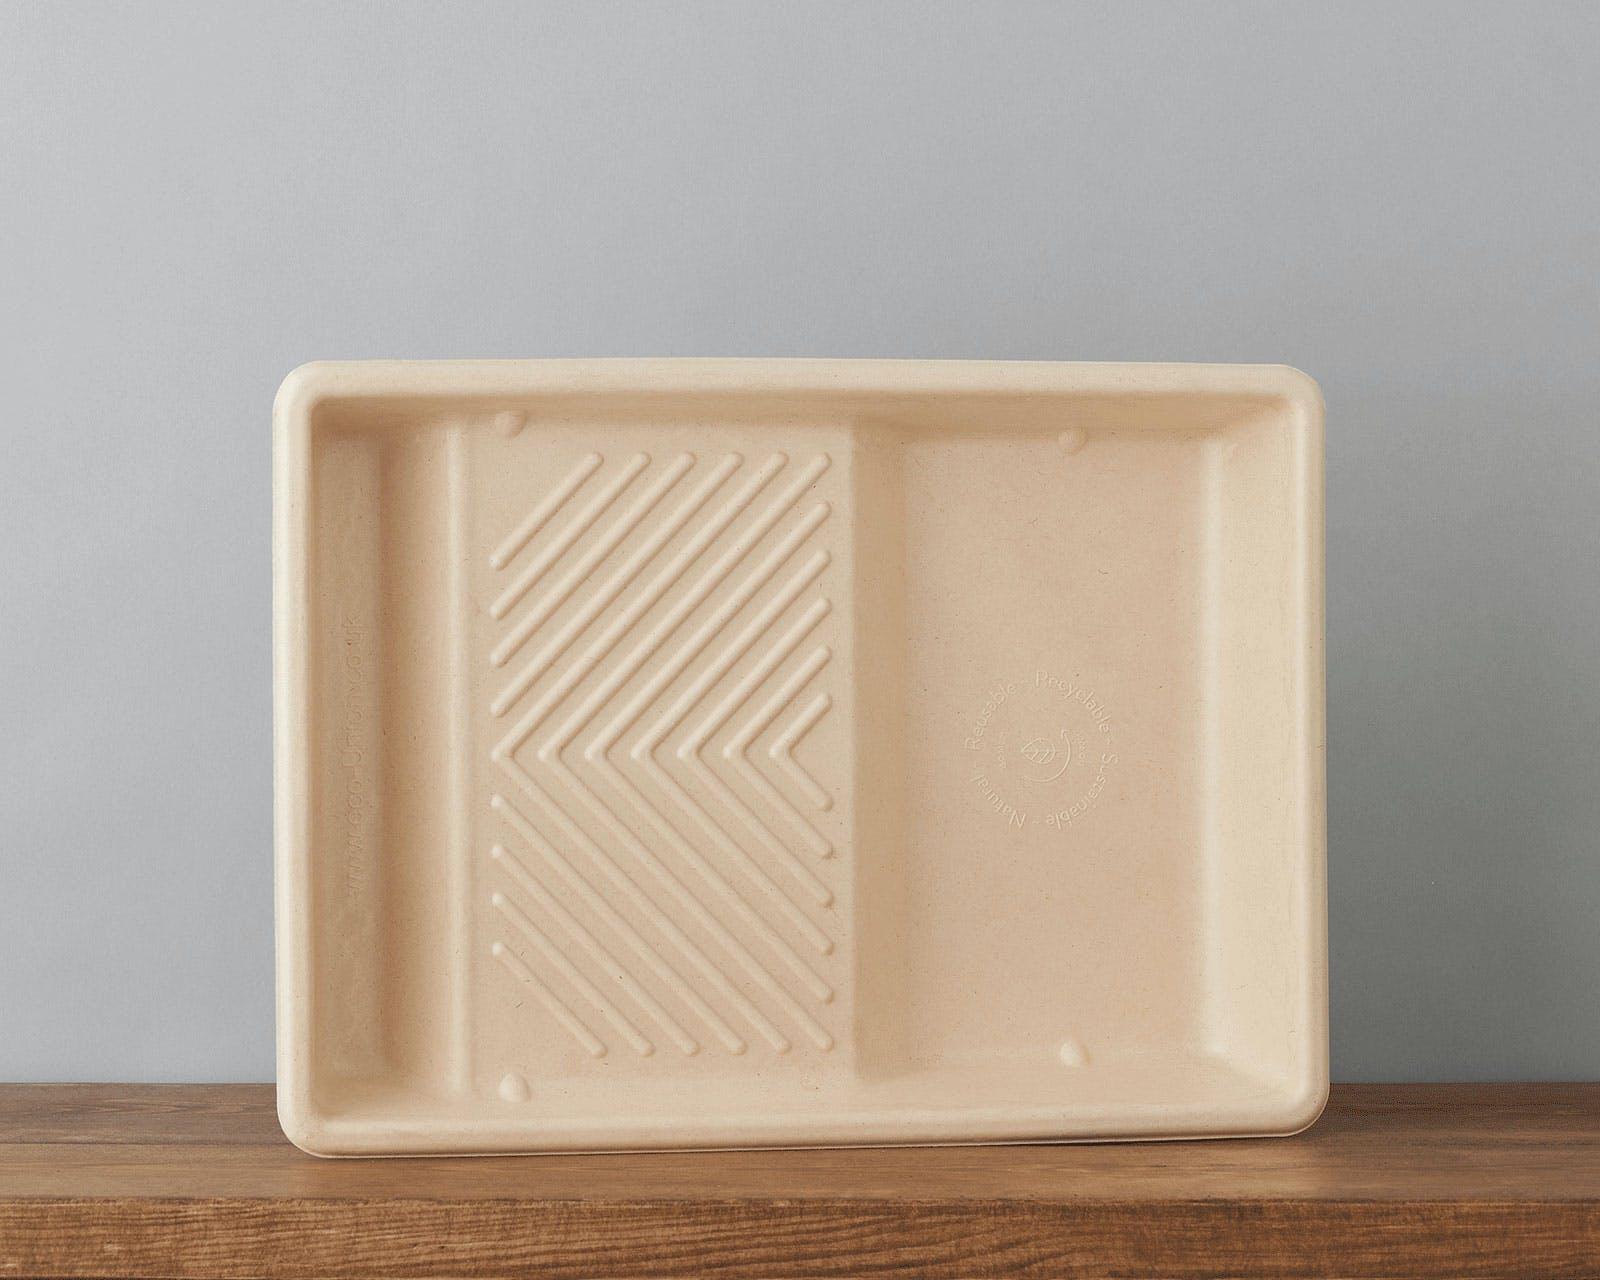 Lick home eco-friendly pulp tray